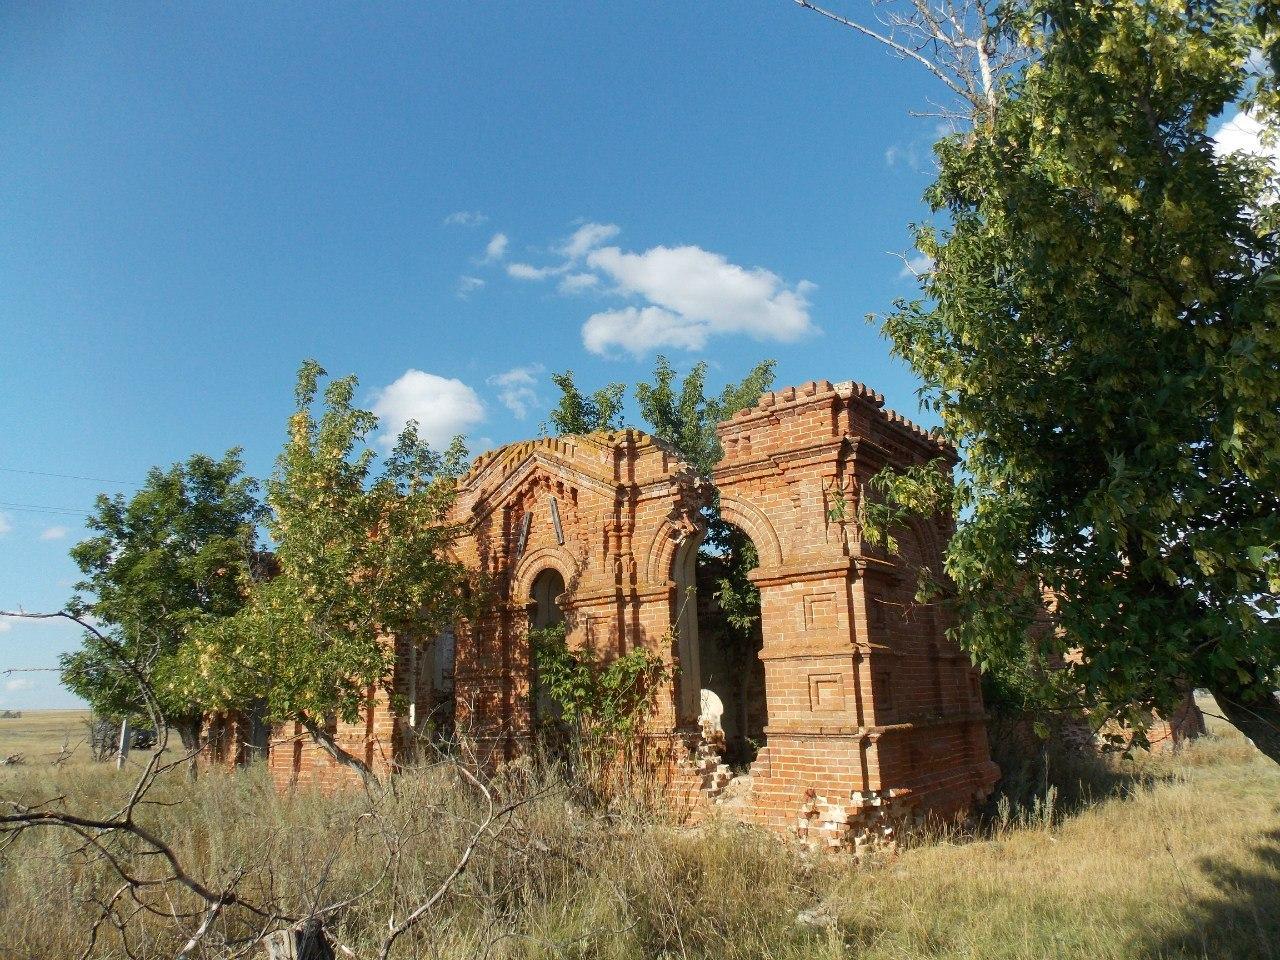 Церковь-школа во имя Николая Чудотворца